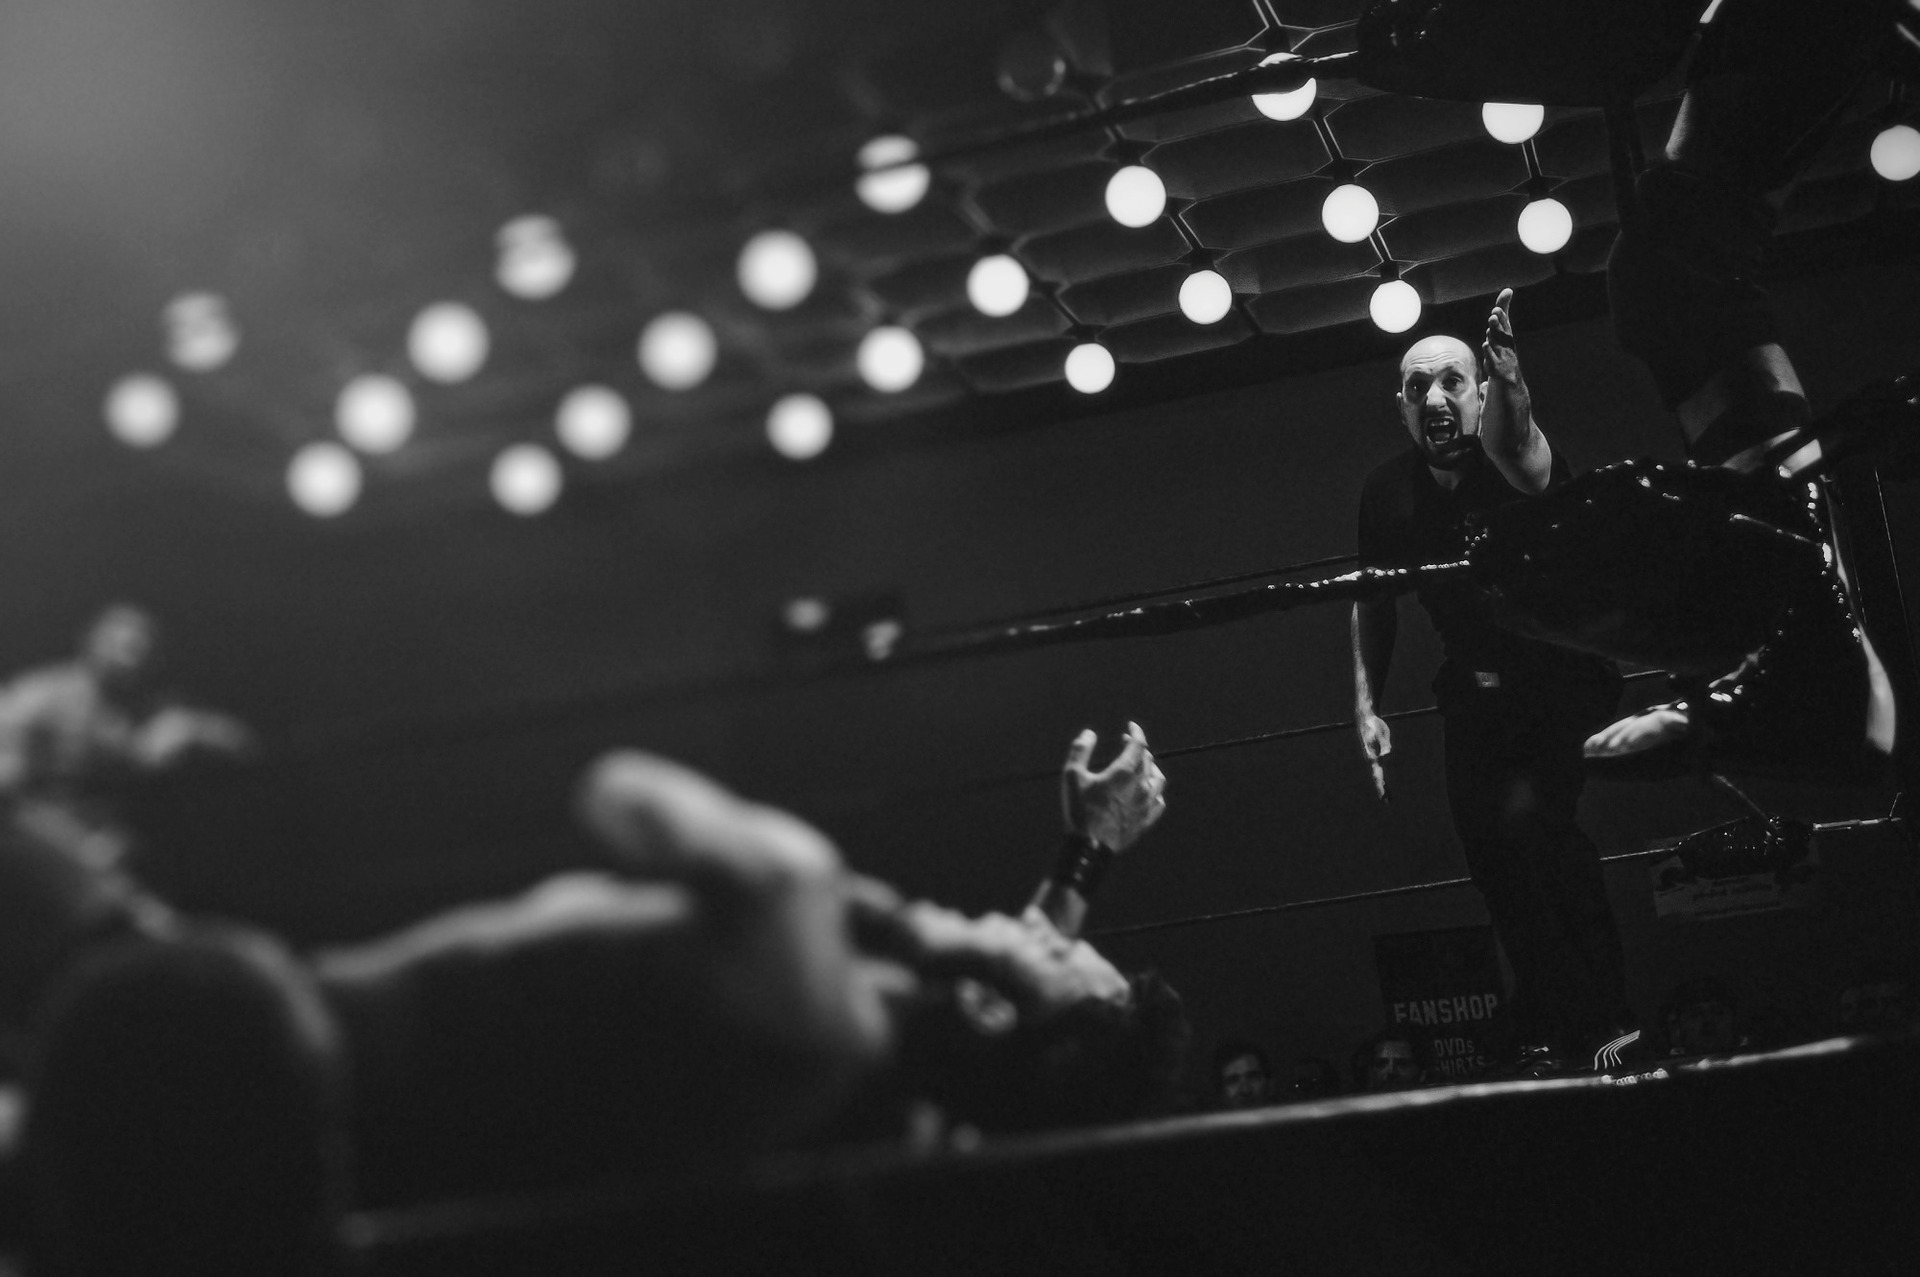 boxing-984174_1920.jpg